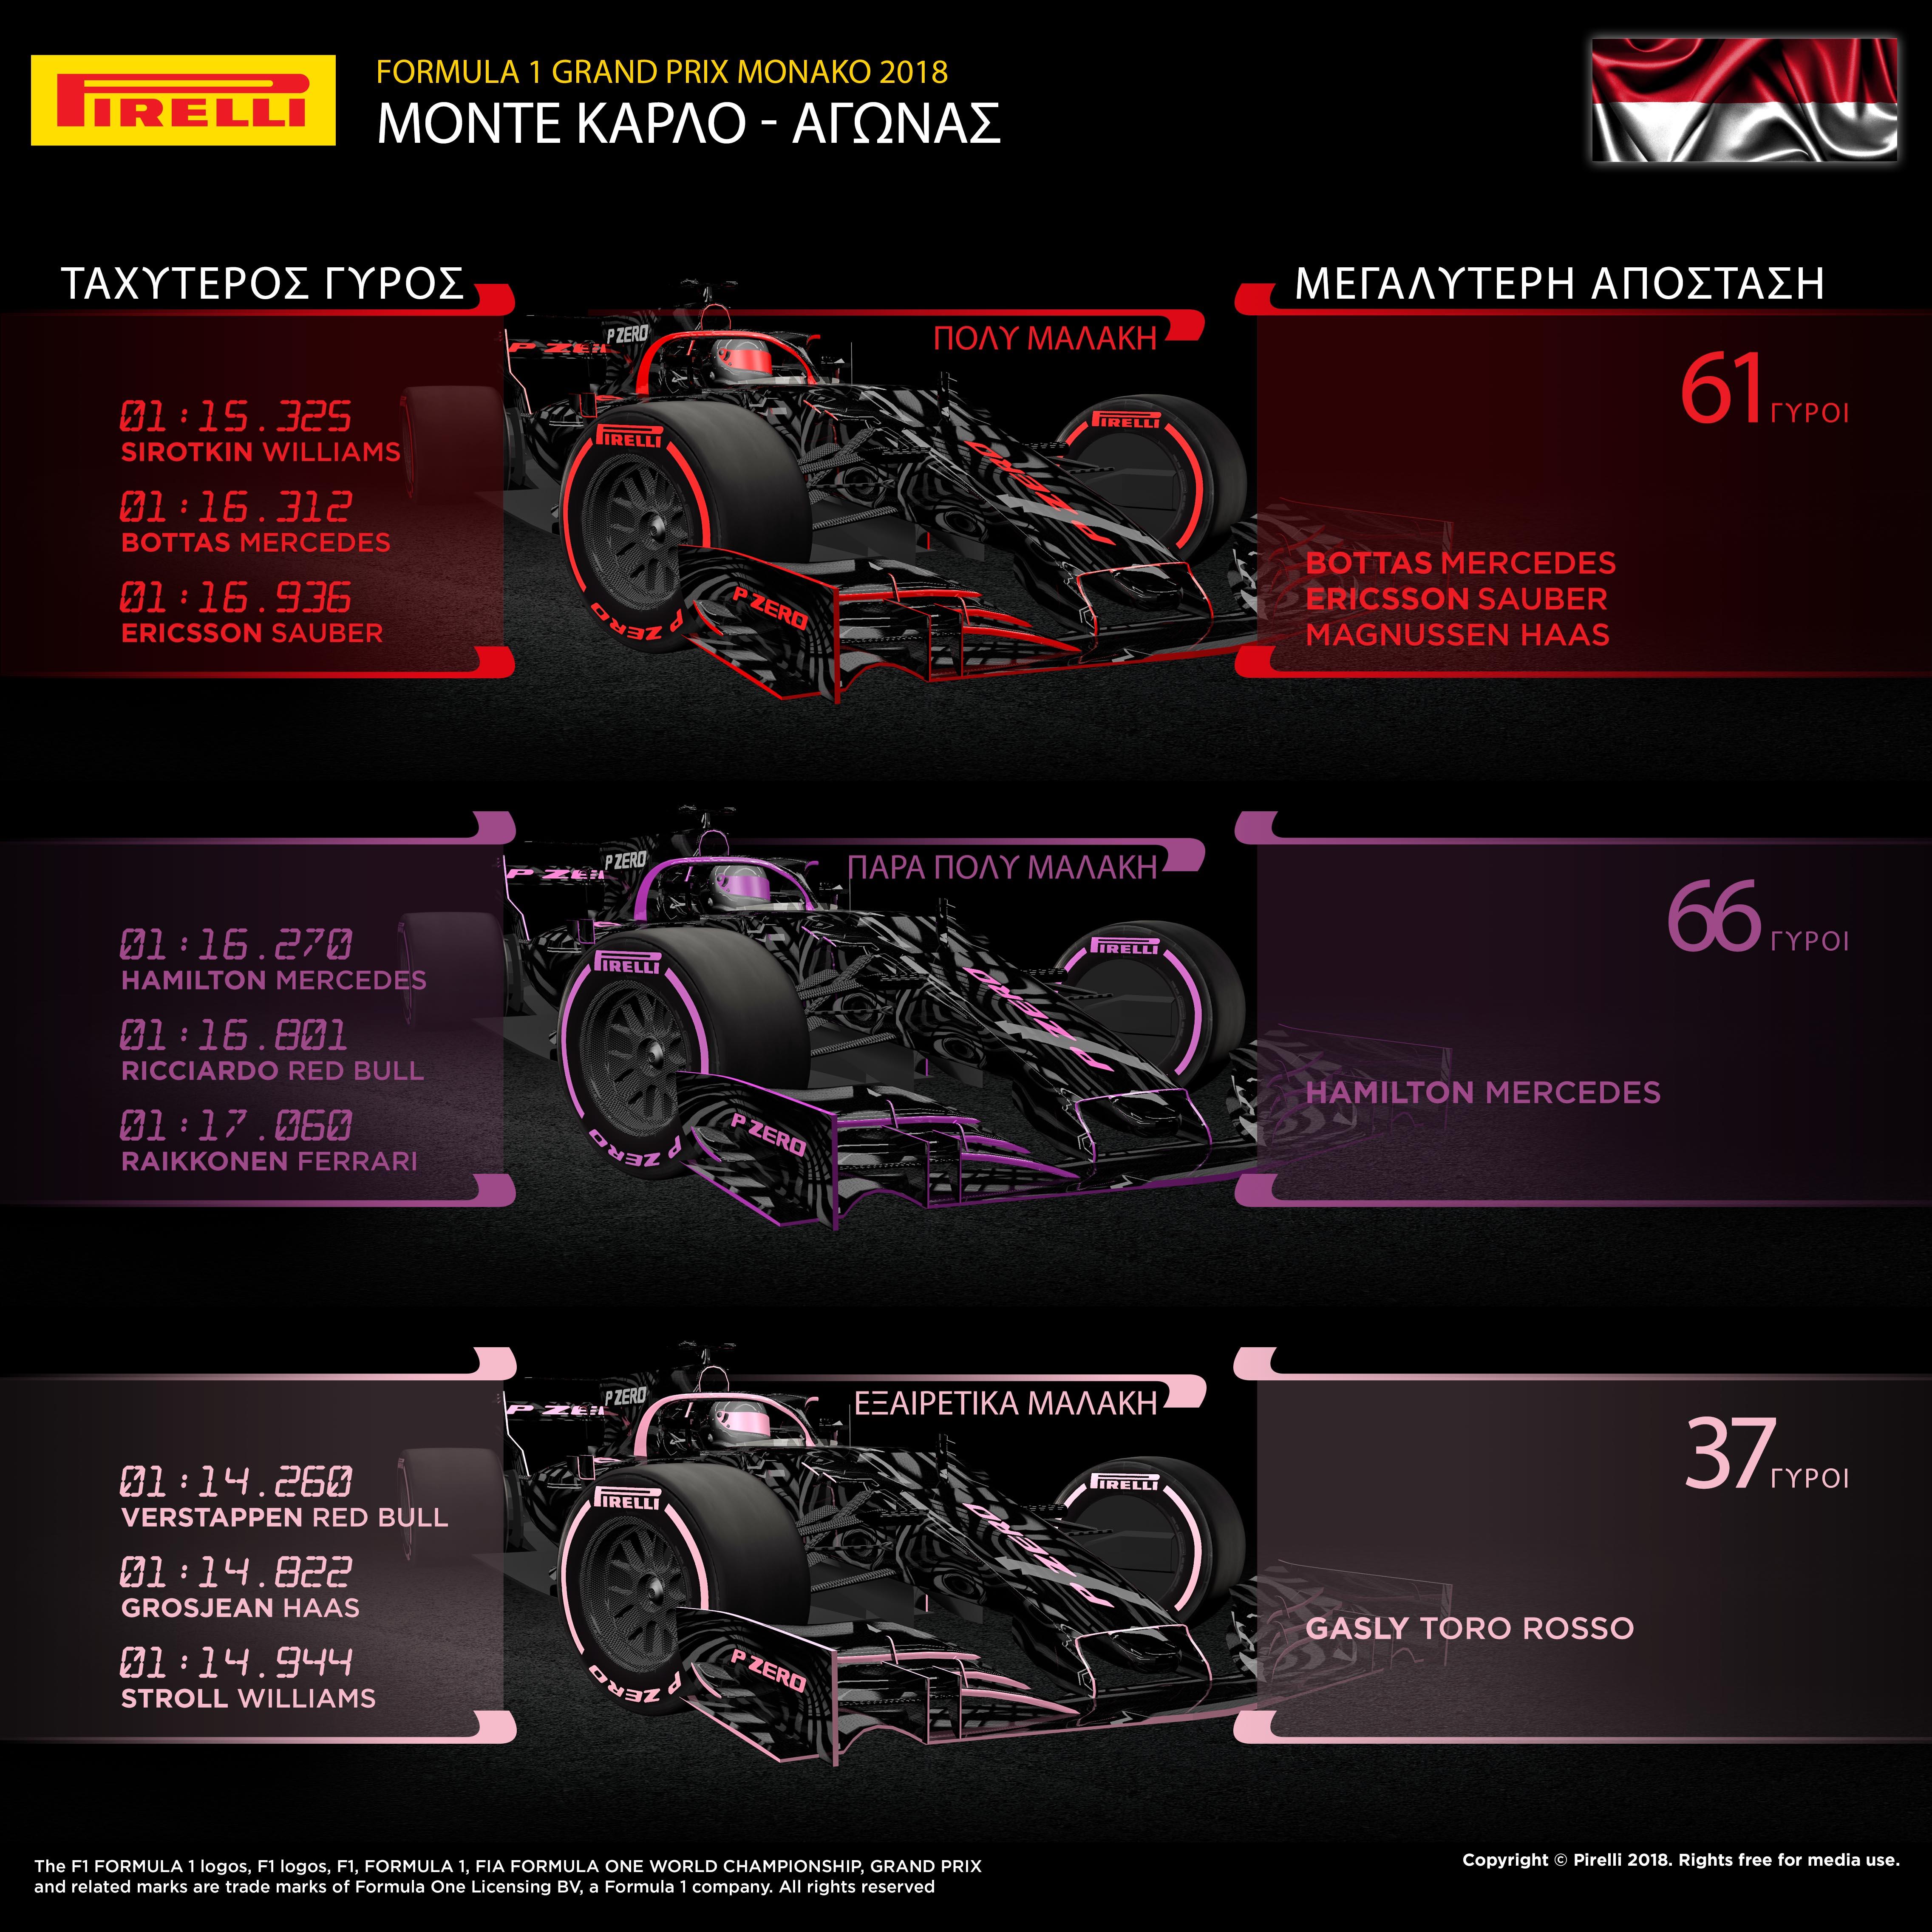 "Η συντριπτική πλειοψηφία των οδηγών υιοθέτησε στρατηγική μιας αλλαγής ελαστικών στο Grand Prix του Μονακό. Ο αγώνας αυτός φορτίζει λιγότερο από κάθε άλλον τα ελαστικά, έτσι η διαχείριση της πτώσης απόδοσης λόγω υπερθέρμανσης είναι καθοριστικής σημασίας, στην επίτευξη ενός καλού αποτελέσματος. Αποτέλεσε δε, κλειδί στη νίκη του οδηγού της Red Bull, Daniel Ricciardo ο οποίος εκκίνησε από την pole position. Τόσο ο νικητής όσο και οι υπόλοιποι οδηγοί στην πρώτη δεκάδα, εκκίνησαν με την ολοκαίνουργια εξαιρετικά μαλακή ροζ γόμα P Zero Pink hypersoft. Ο Ricciardo διατήρησε τον έλεγχο στην πρώτη θέση, αυτό σε συνδυασμό με τη γνωστή δυσκολία στα προσπεράσματα είχε ως αποτέλεσμα έναν αργό, σε ρυθμό, αγώνα. Το ρεκόρ γύρου επετεύχθη προς το τέλος χάρη στην Red Bull του Max Verstappen. Ο Ολλανδός μετά από 48 γύρους άλλαξε την πάρα πολύ μαλακή γόμα (ultrasoft) με εξαιρετικά μαλακή γόμα (hypersoft). Απ' όλους όσοι δεν εκκίνησαν με την εξαιρετικά μαλακή γόμα ψηλότερα τερμάτισε ο οδηγός της Renault, Nico Hulkenberg. Ο Γερμανός εκκίνησε 11ος και τερμάτισε 8ος υιοθετώντας μια εναλλακτική στρατηγική μιας αλλαγής από πάρα πολύ μαλακή σε εξαιρετικά μαλακή γόμα. Ο αγώνας διεξήχθη κάτω από ζεστές και στεγνές συνθήκες μολονότι μια ώρα πριν την εκκίνηση είχε ψιχαλίσει. Η θερμοκρασία στον αέρα ήταν στους 18 βαθμούς Κελσίου και στο οδόστρωμα στους 32 βαθμούς Κελσίου. MARIO ISOLA - ΕΠΙΚΕΦΑΛΗΣ ΑΓΩΝΩΝ ΑΥΤΟΚΙΝΗΤΟΥ ""Είδαμε μεγαλύτερη ποικιλία στρατηγικών στο Μονακό σε σχέση με τα προηγούμενα χρόνια. Εκπληρώθηκε ο ρόλος που ελπίζαμε να παίξει η νέα εξαιρετικά μαλακή γόμα η οποία αποτέλεσε μια ακόμη παράμετρο στο ανταγωνιστικό μείγμα παραγόντων. Ως αποτέλεσμα είχαμε τον ταχύτερο γύρο όλων των εποχών στο Μονακό χάρη σ' ένα ελαστικό το οποίο οι οδηγοί απολαμβάνουν να χρησιμοποιούν τόσο στις δοκιμές όσο και στον αγώνα. Καθώς το κράτημα στη διαδρομή βελτιώνονταν και οι οδηγοί εξοικειώνονταν με την νέα γόμα, κατάφεραν να πάρουν το μέγιστο απ' αυτή, ανάλογα και με τις διάφορες στρατηγικές "". ΚΑΛΥΤΕΡΟΙ ΧΡΟΝΟ"